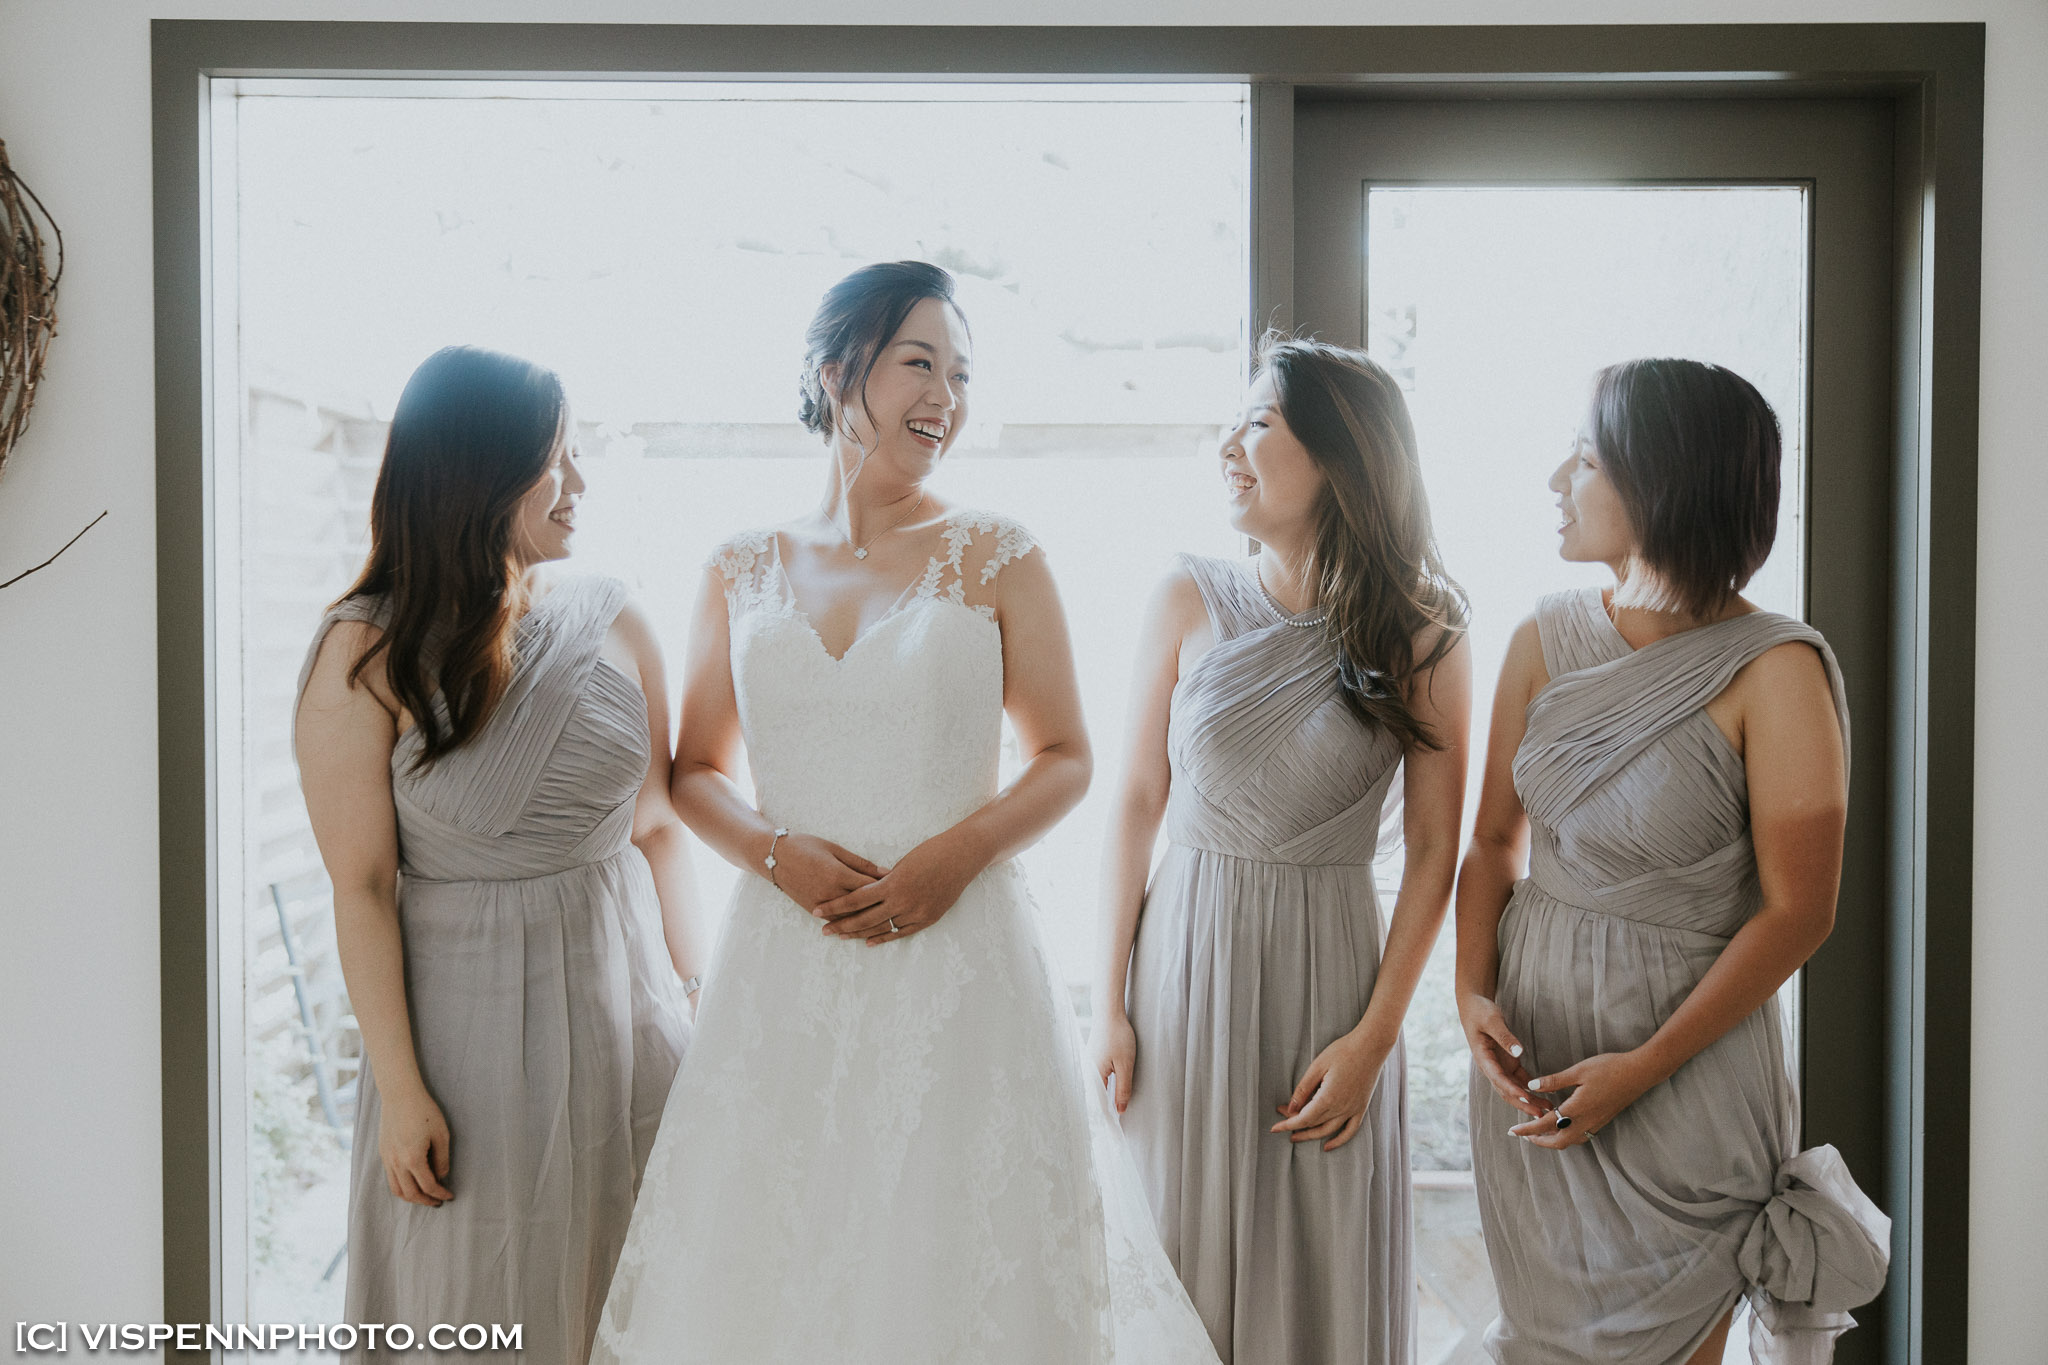 WEDDING DAY Photography Melbourne VISPENN 墨尔本 婚礼跟拍 婚礼摄像 婚礼摄影 结婚照 登记照 LeanneWesley 02375 1P EOSR VISPENN